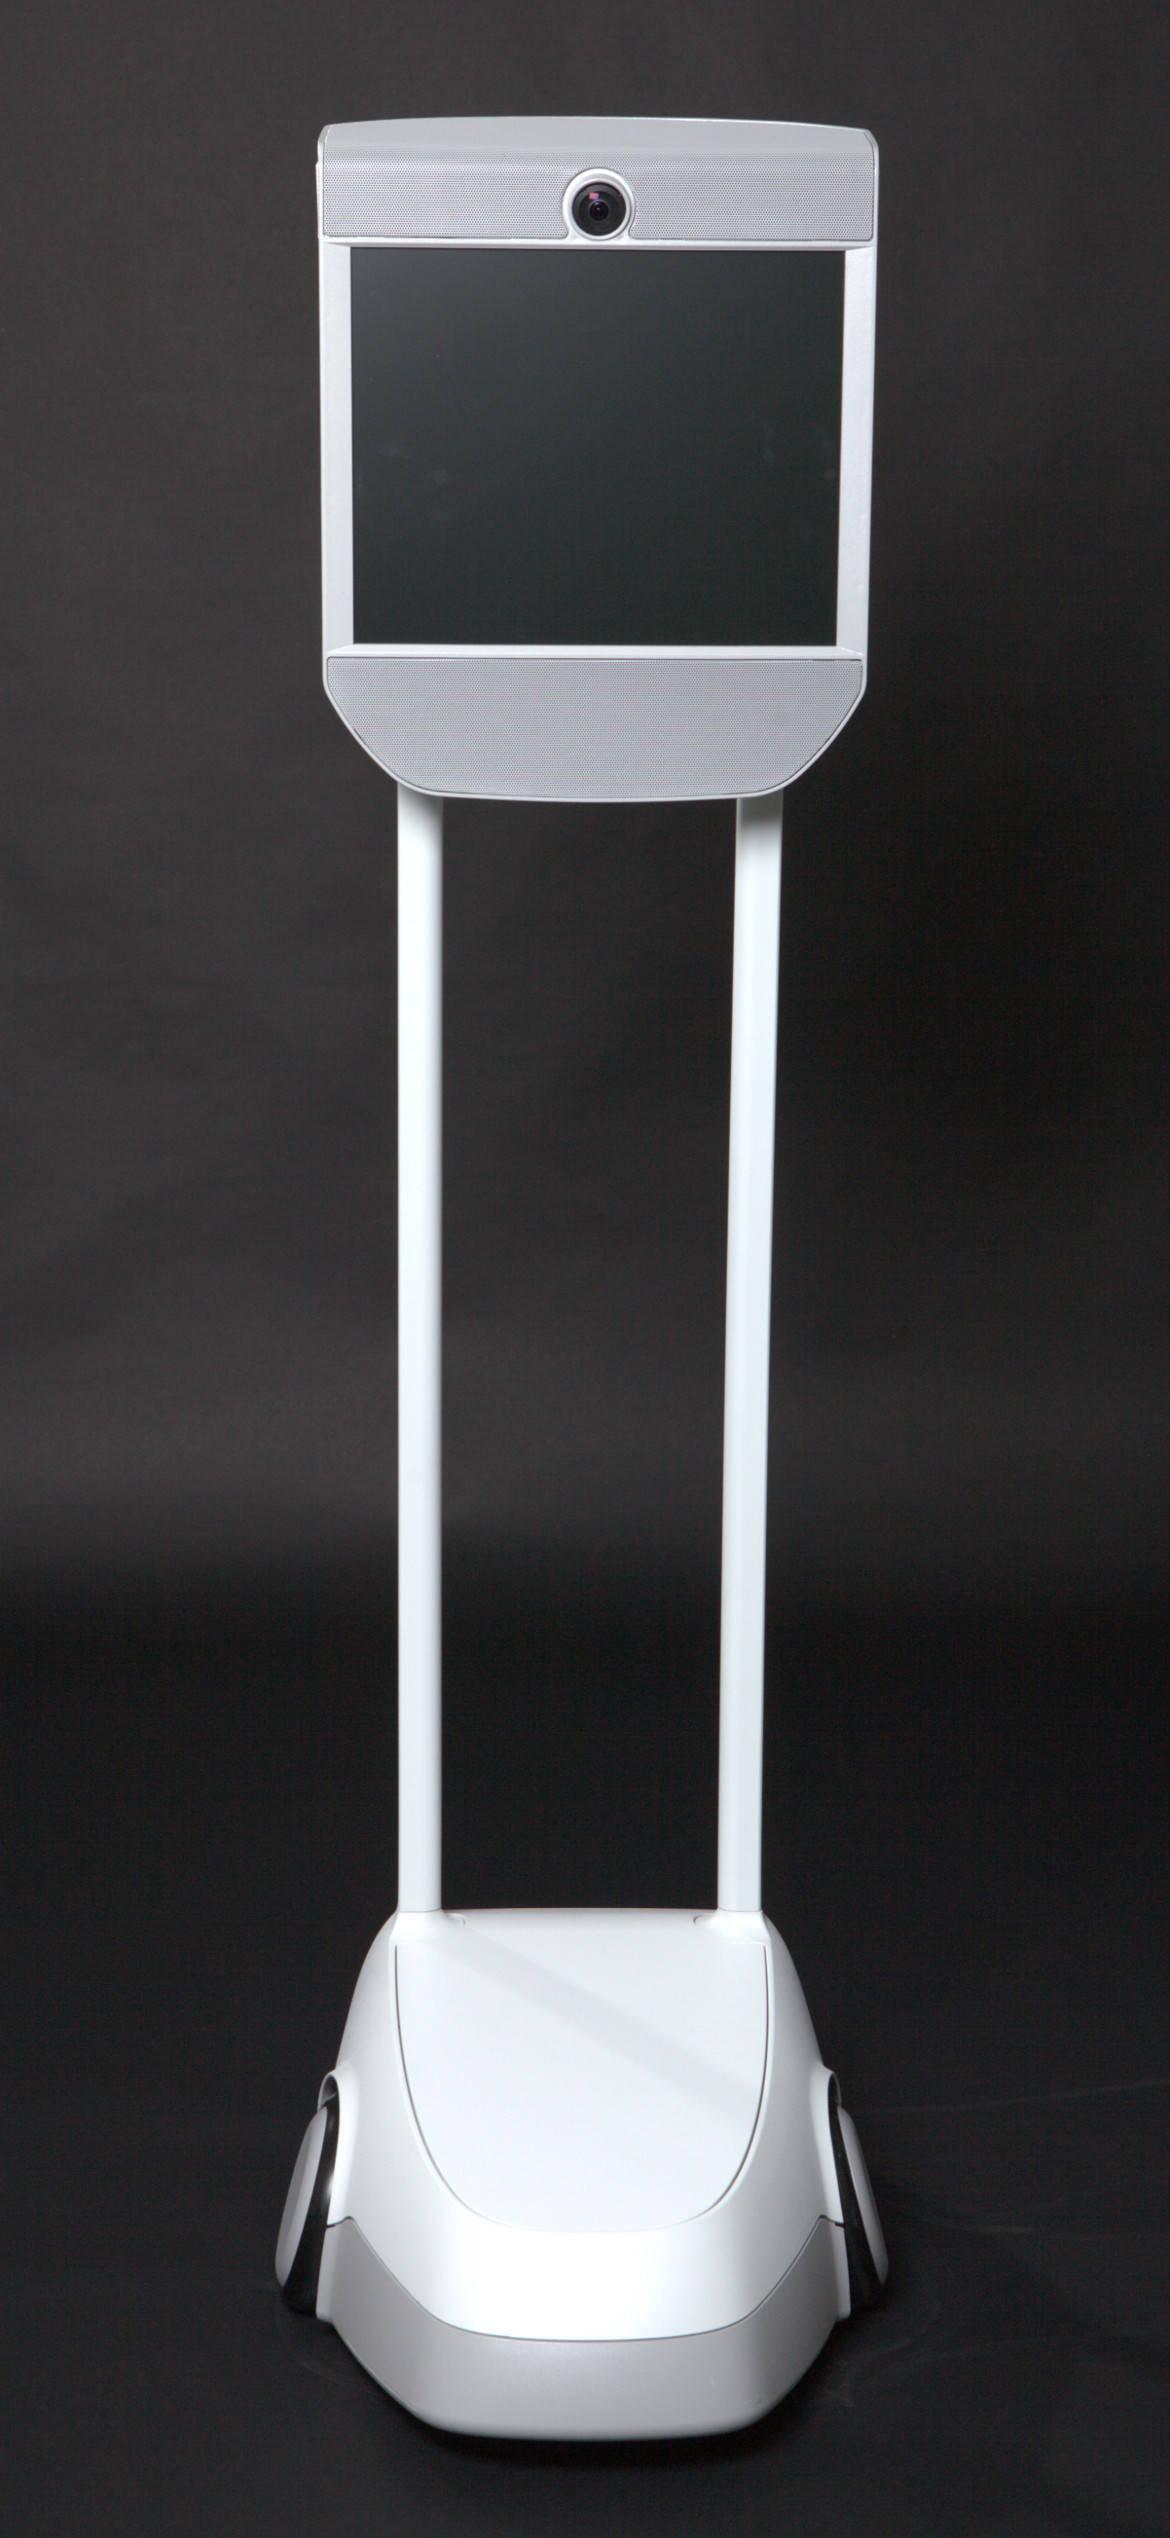 Beam Remote Presence Device